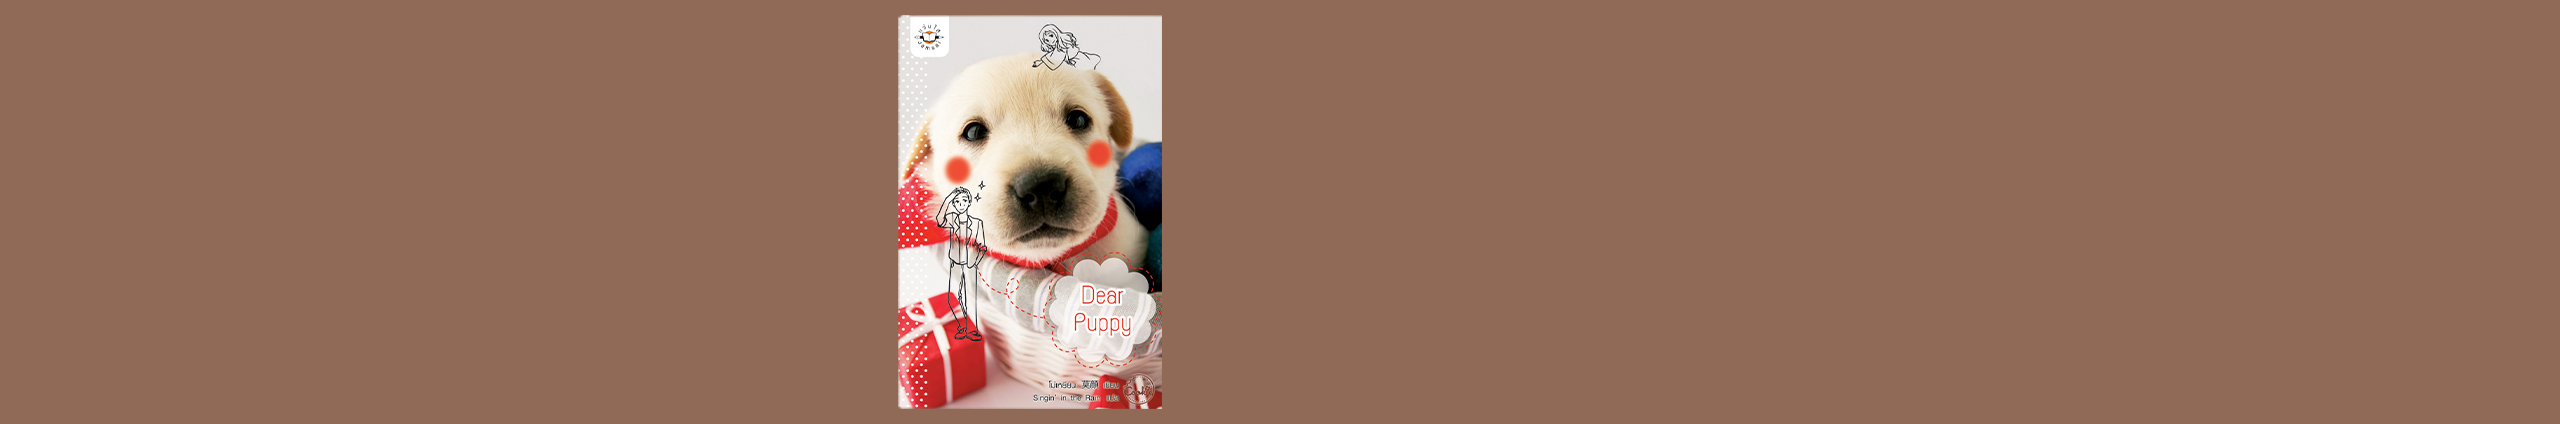 Dear Puppy